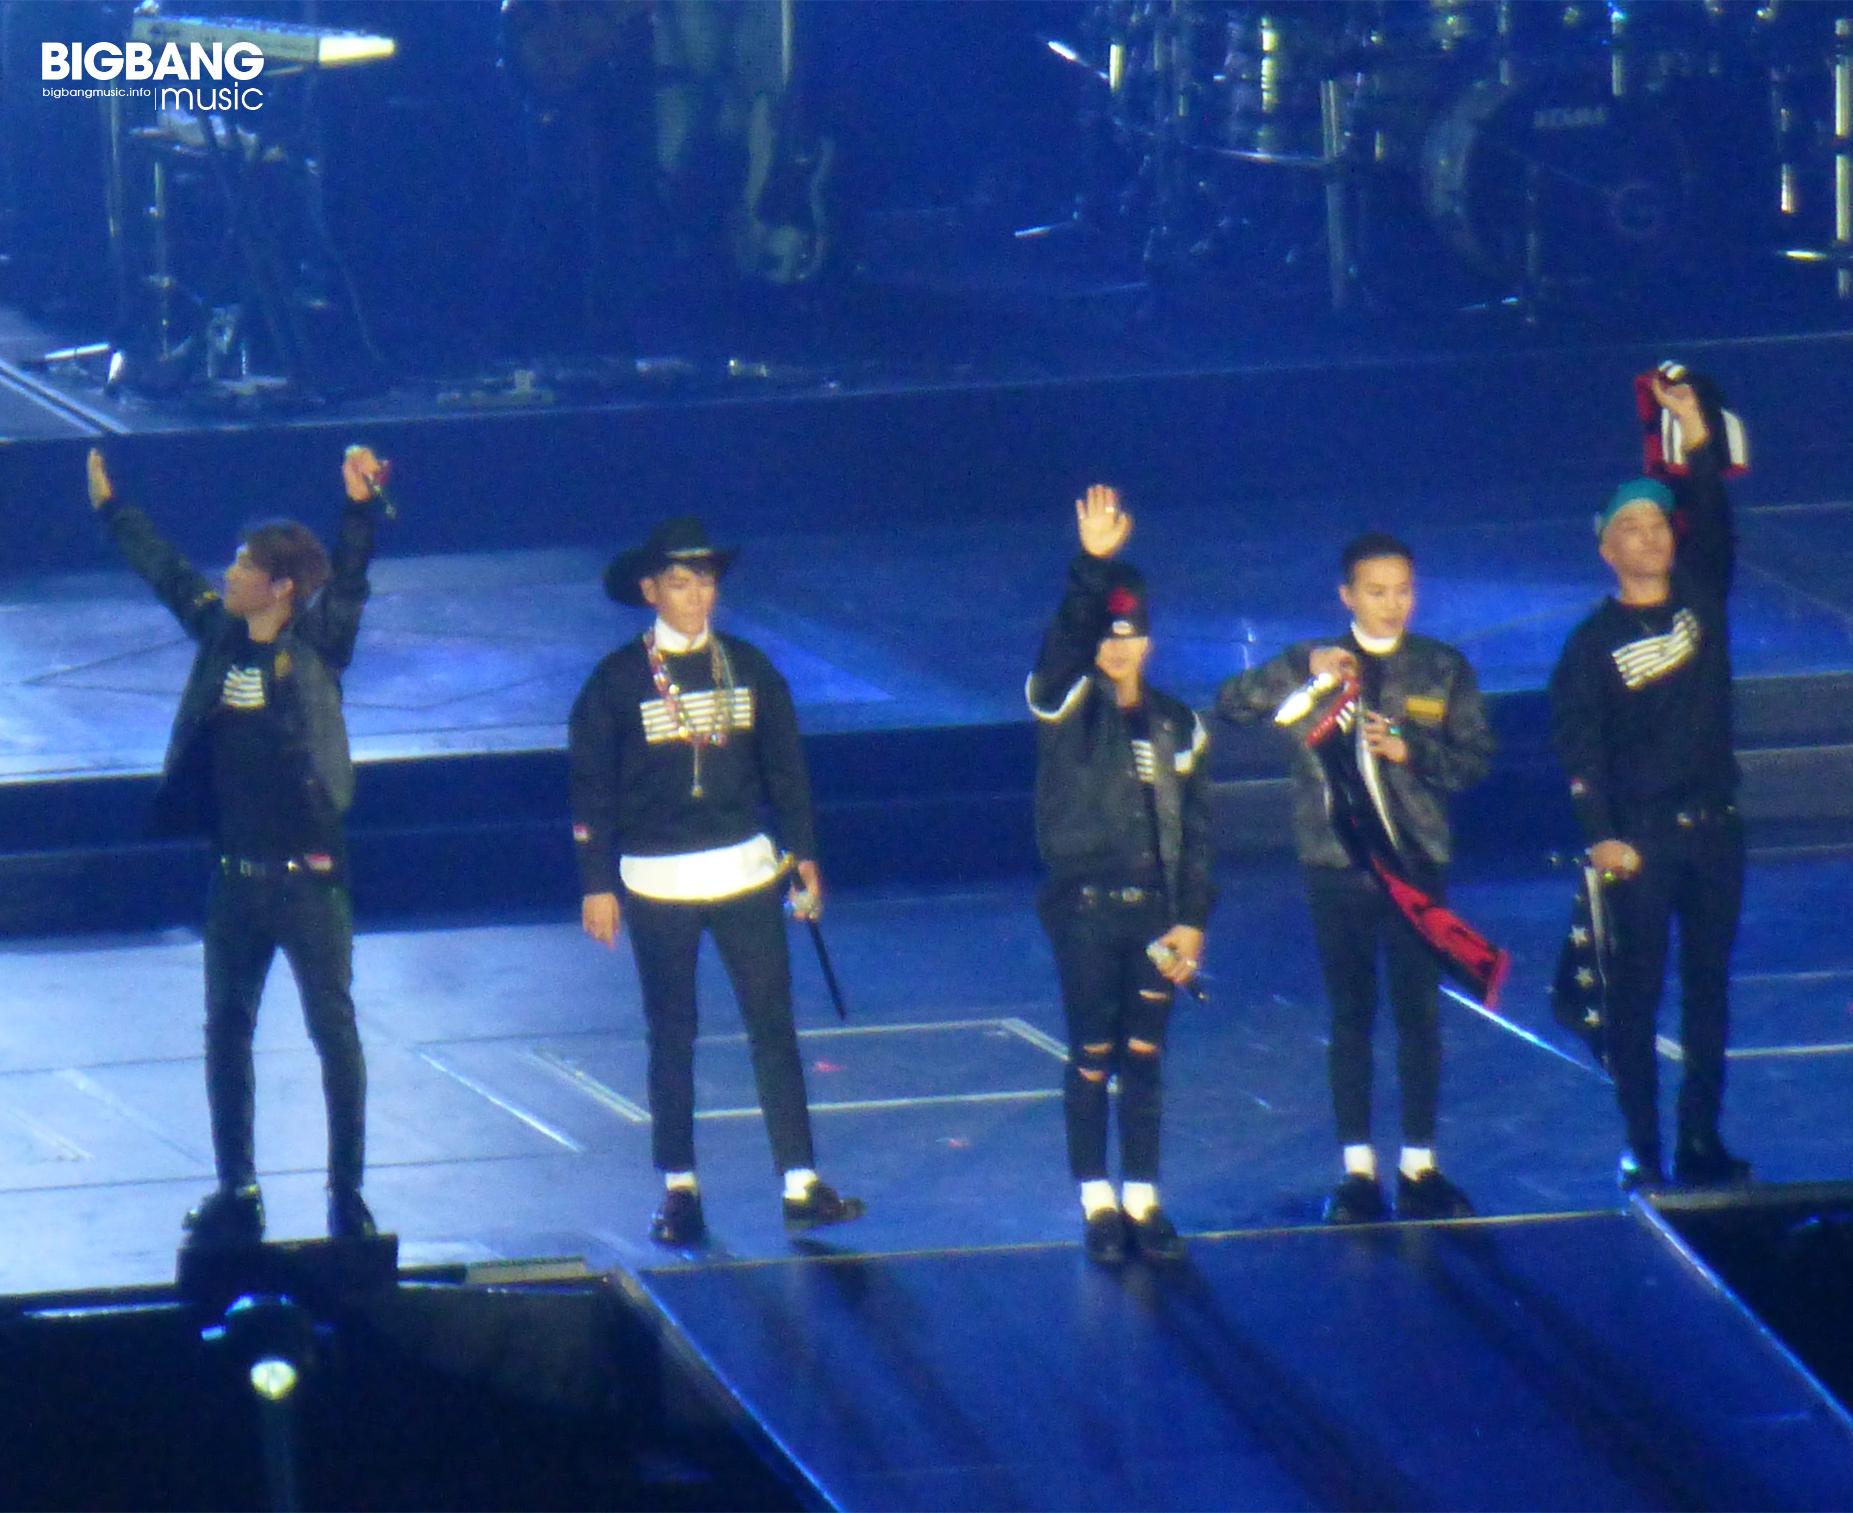 BIGBANG-Osaka-Day-5-2016-01-10-BIGBANG-03.jpg